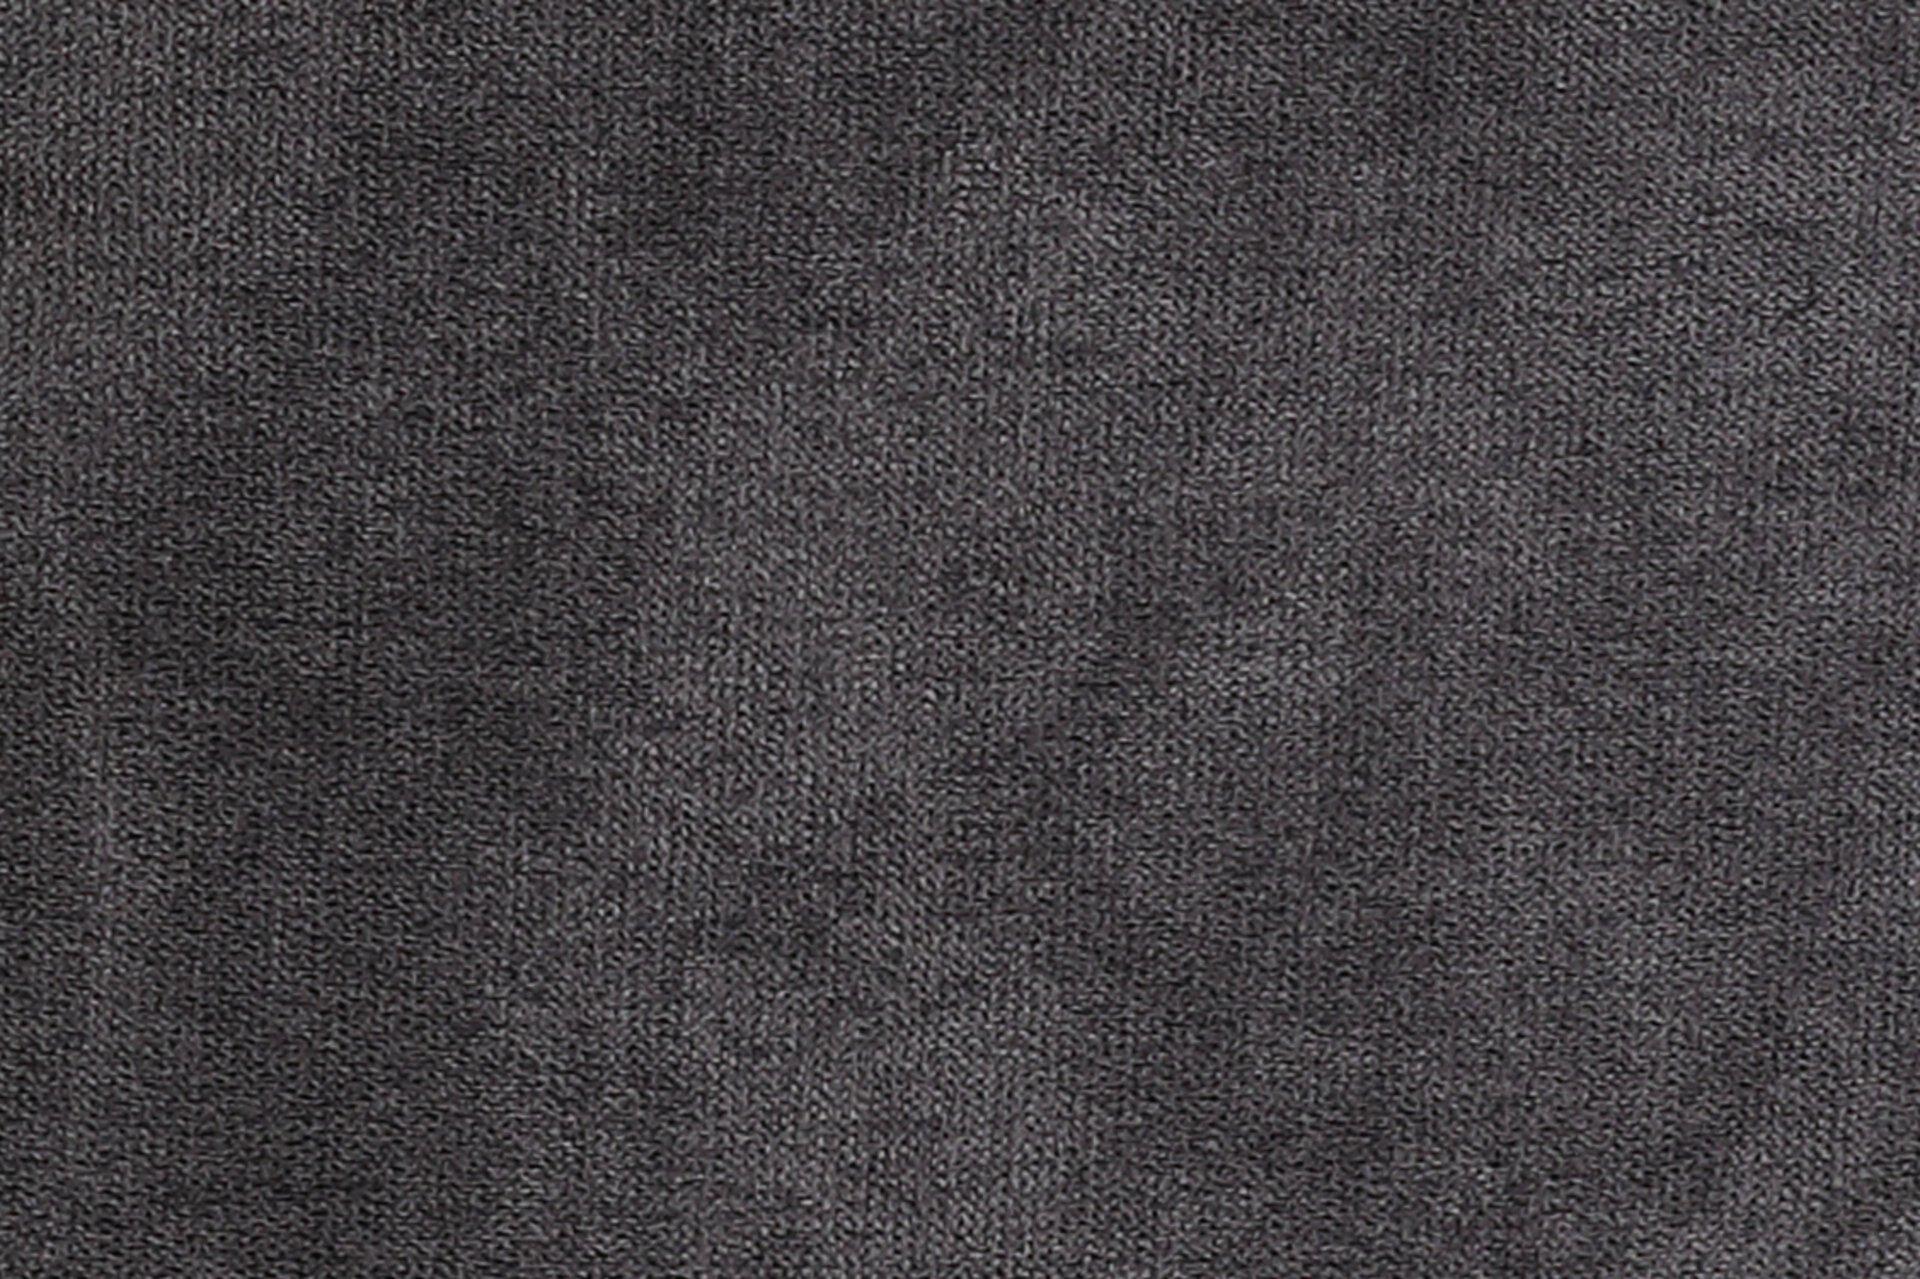 Sitzbank NENA I B Dinett Textil grau 60 x 94 x 140 cm